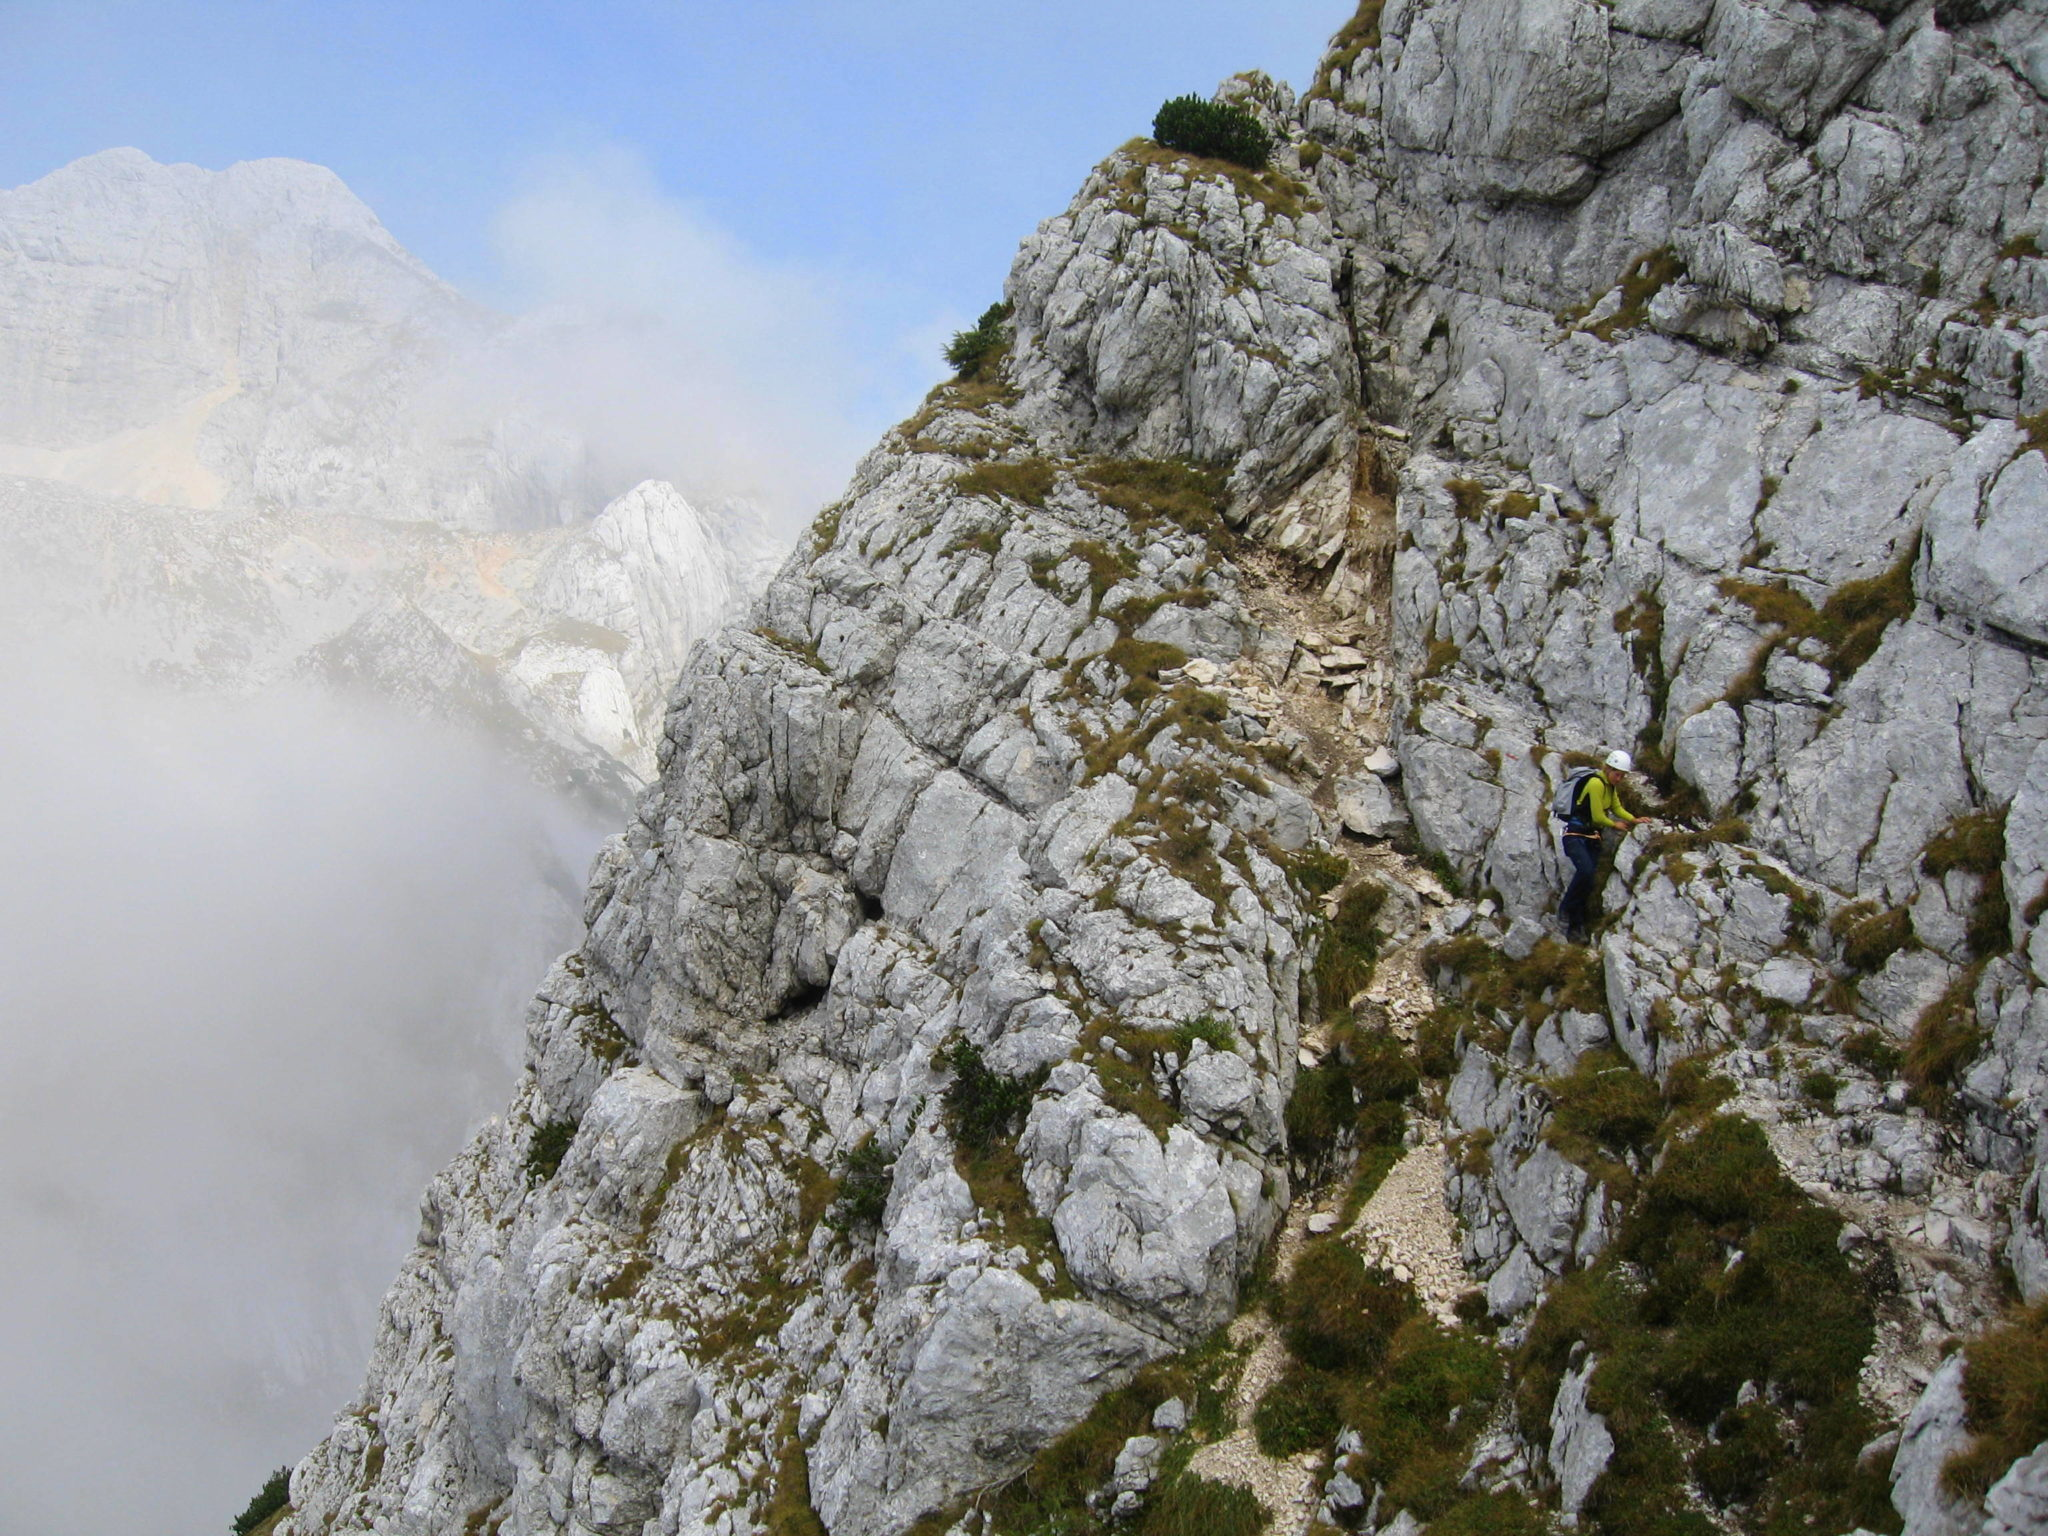 Čez Plemenice, the Bamberg Route to Triglav, crossing Triglav North Face